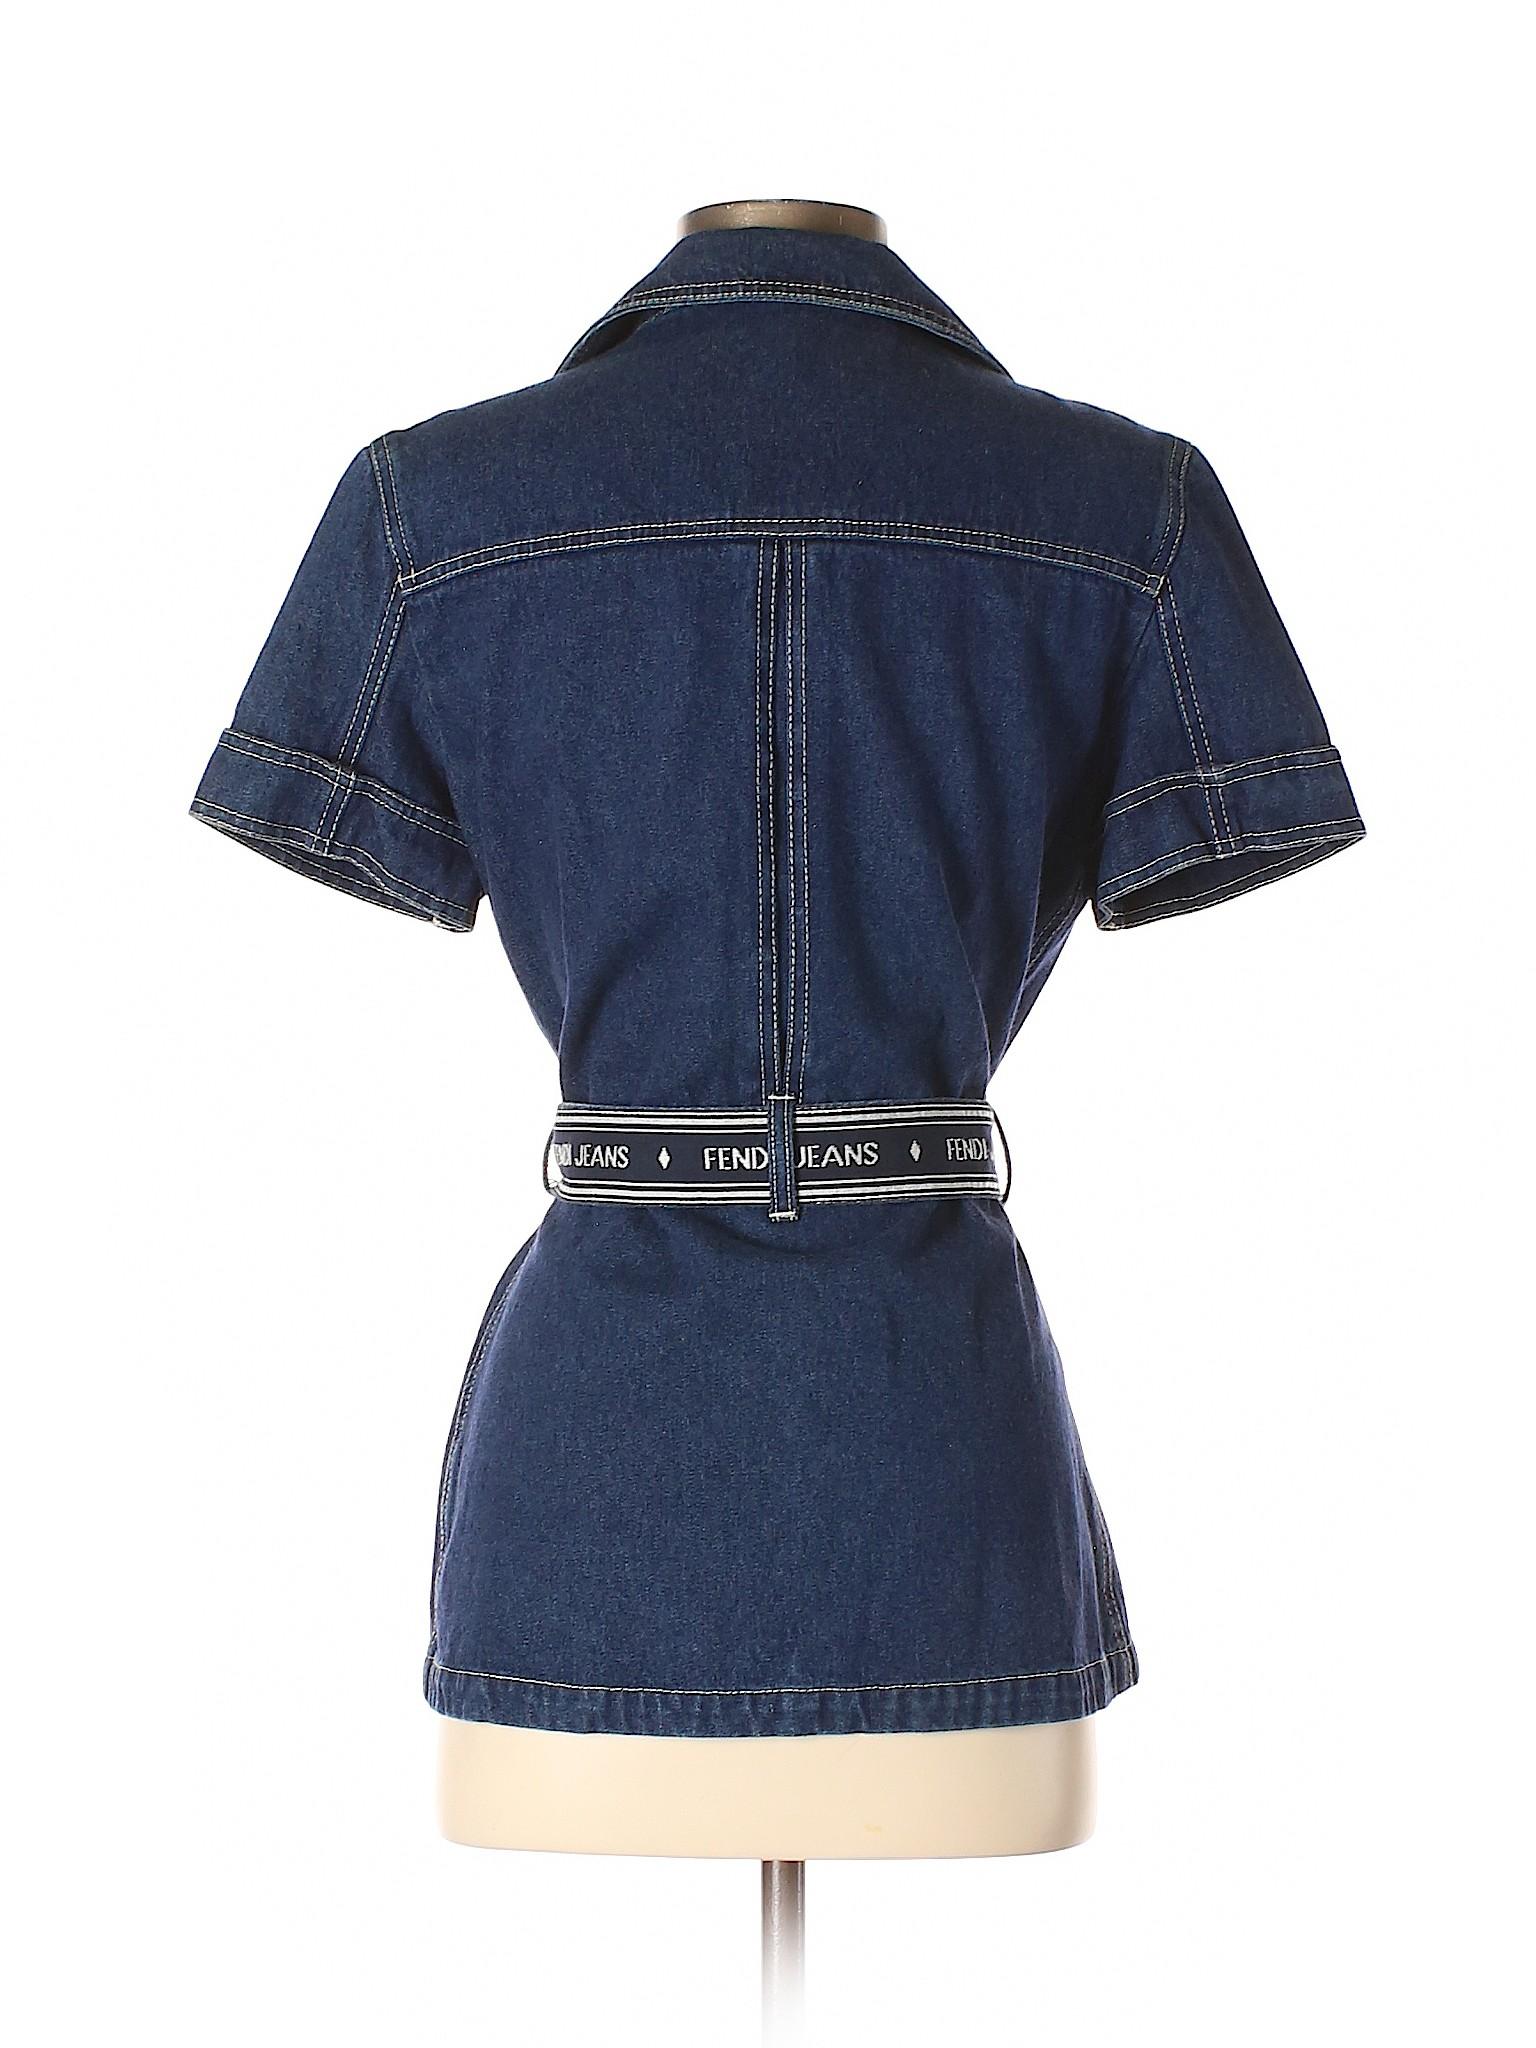 winter Boutique Jeans Fendi Jacket Denim x8F8Uw